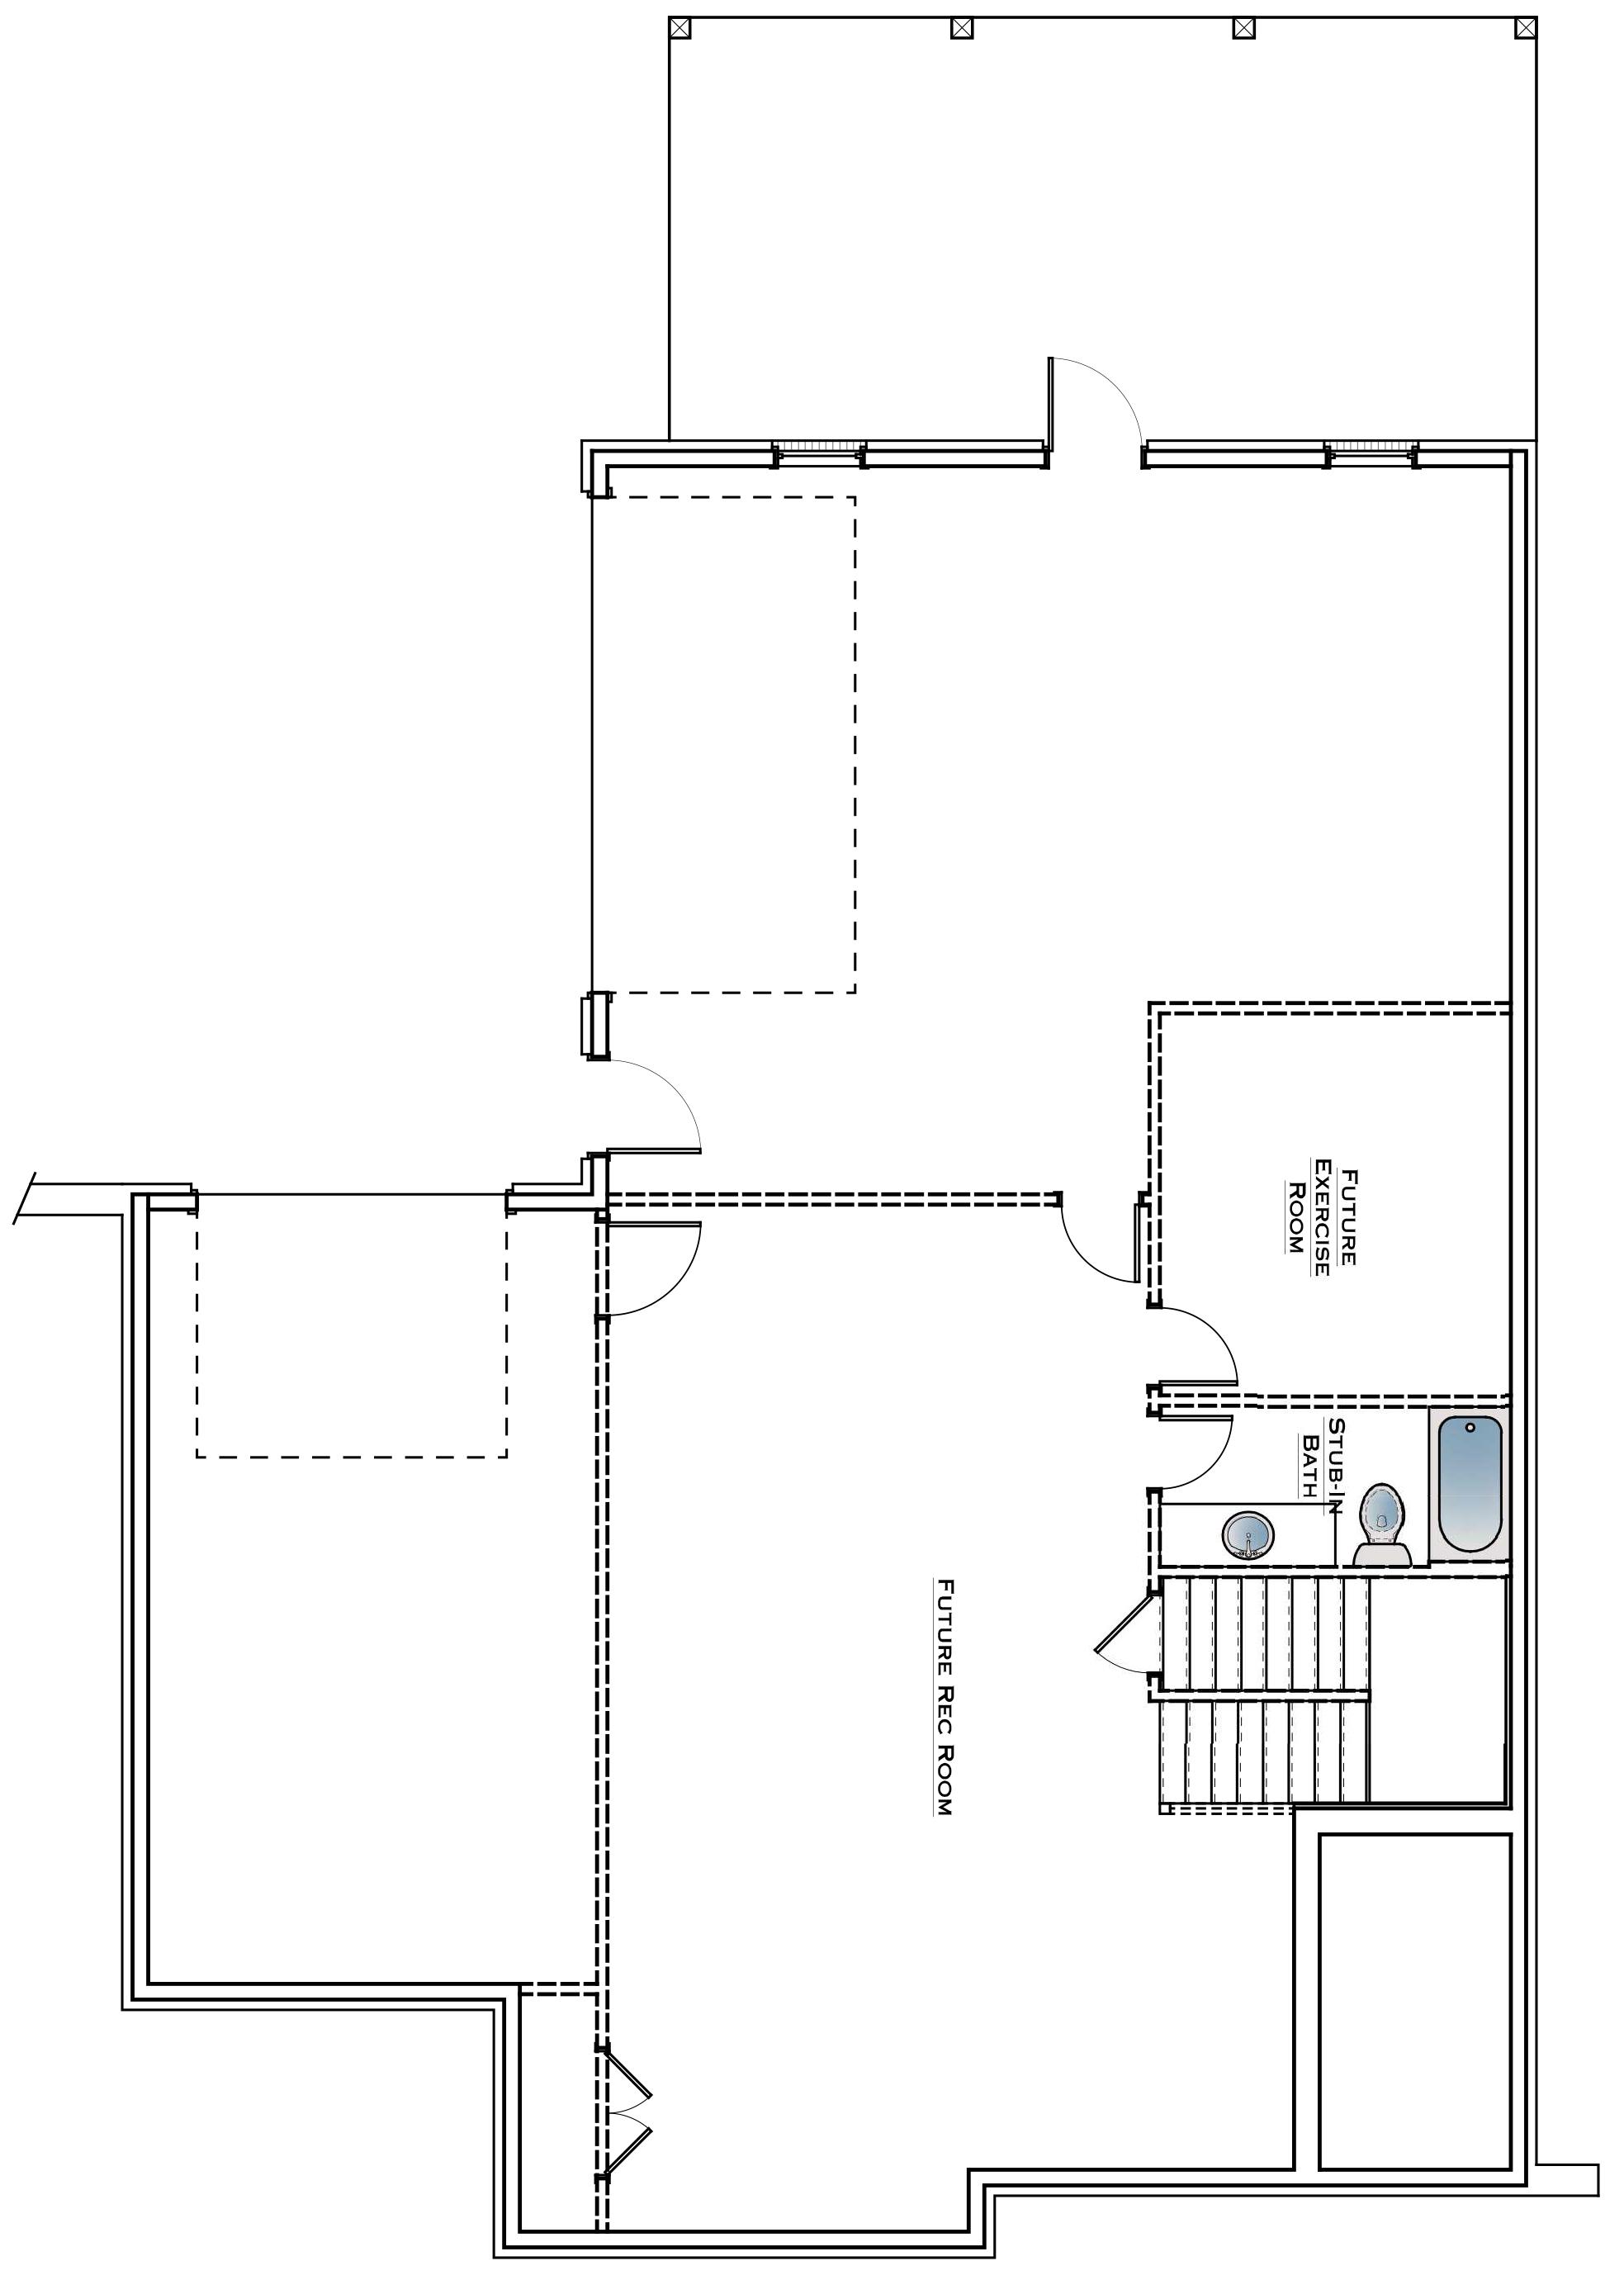 Southbend Lot 8 Basement